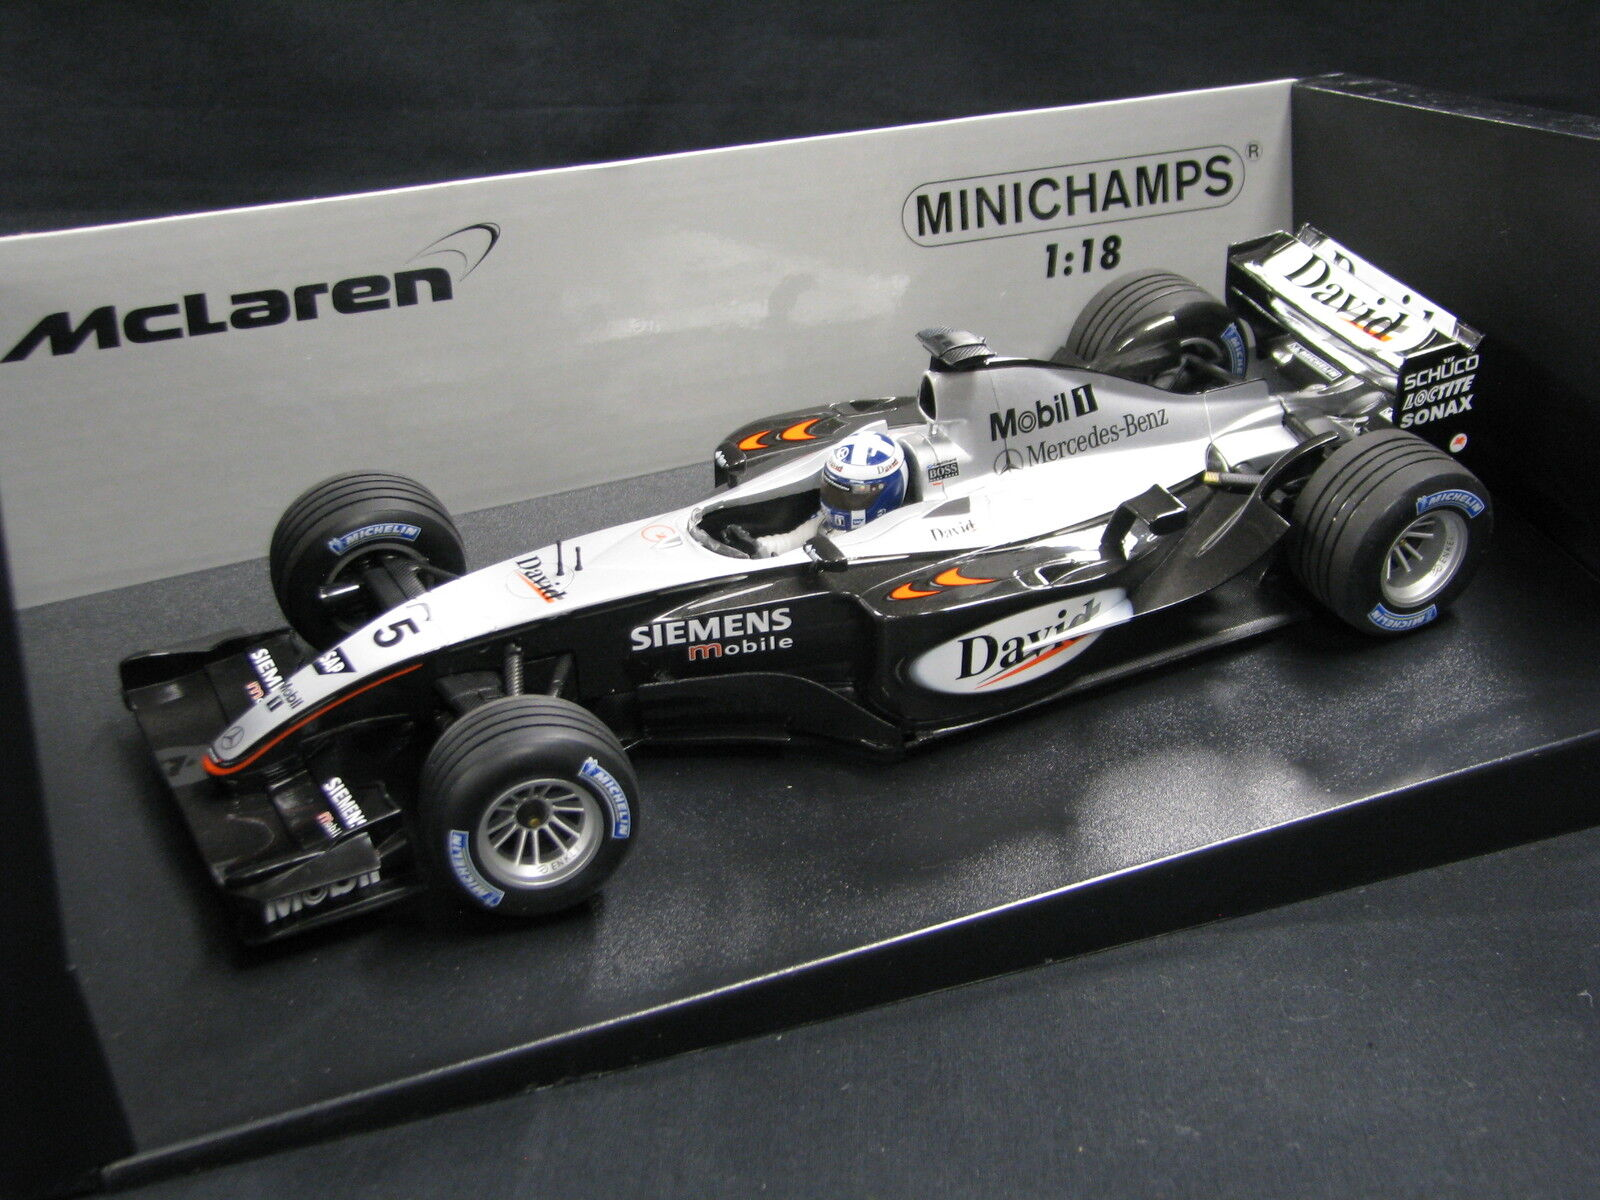 Minichamps McLaren Mercedes MP4 18 2003 1 1 1 18 Coulthard (FIN) Testcar (JS) 42c4f1